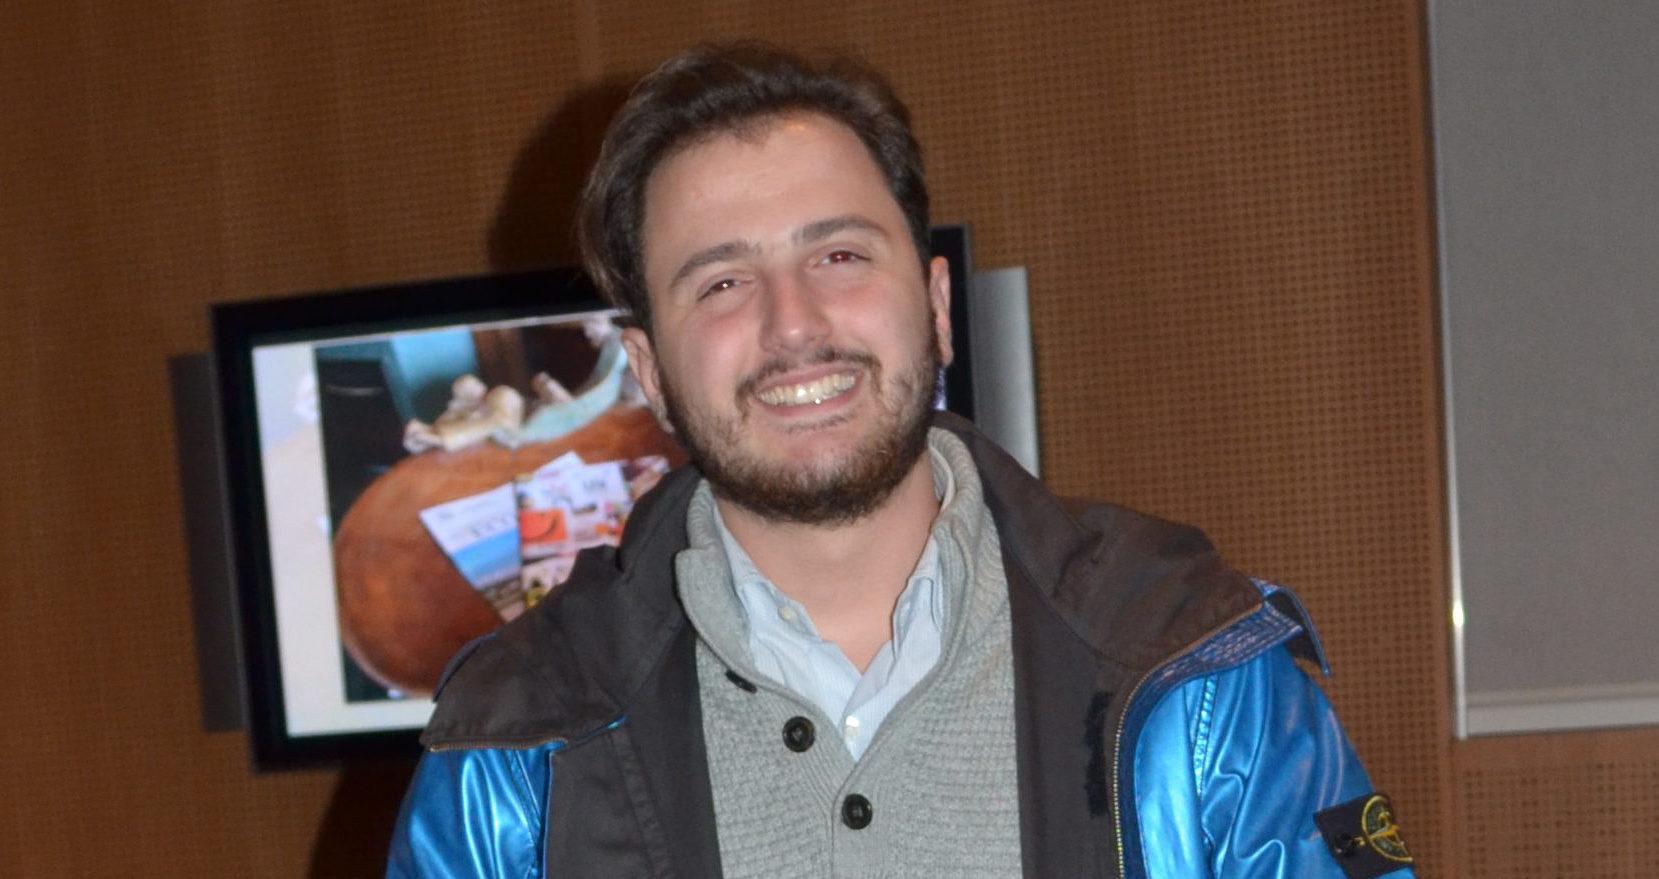 Jacopo Mele